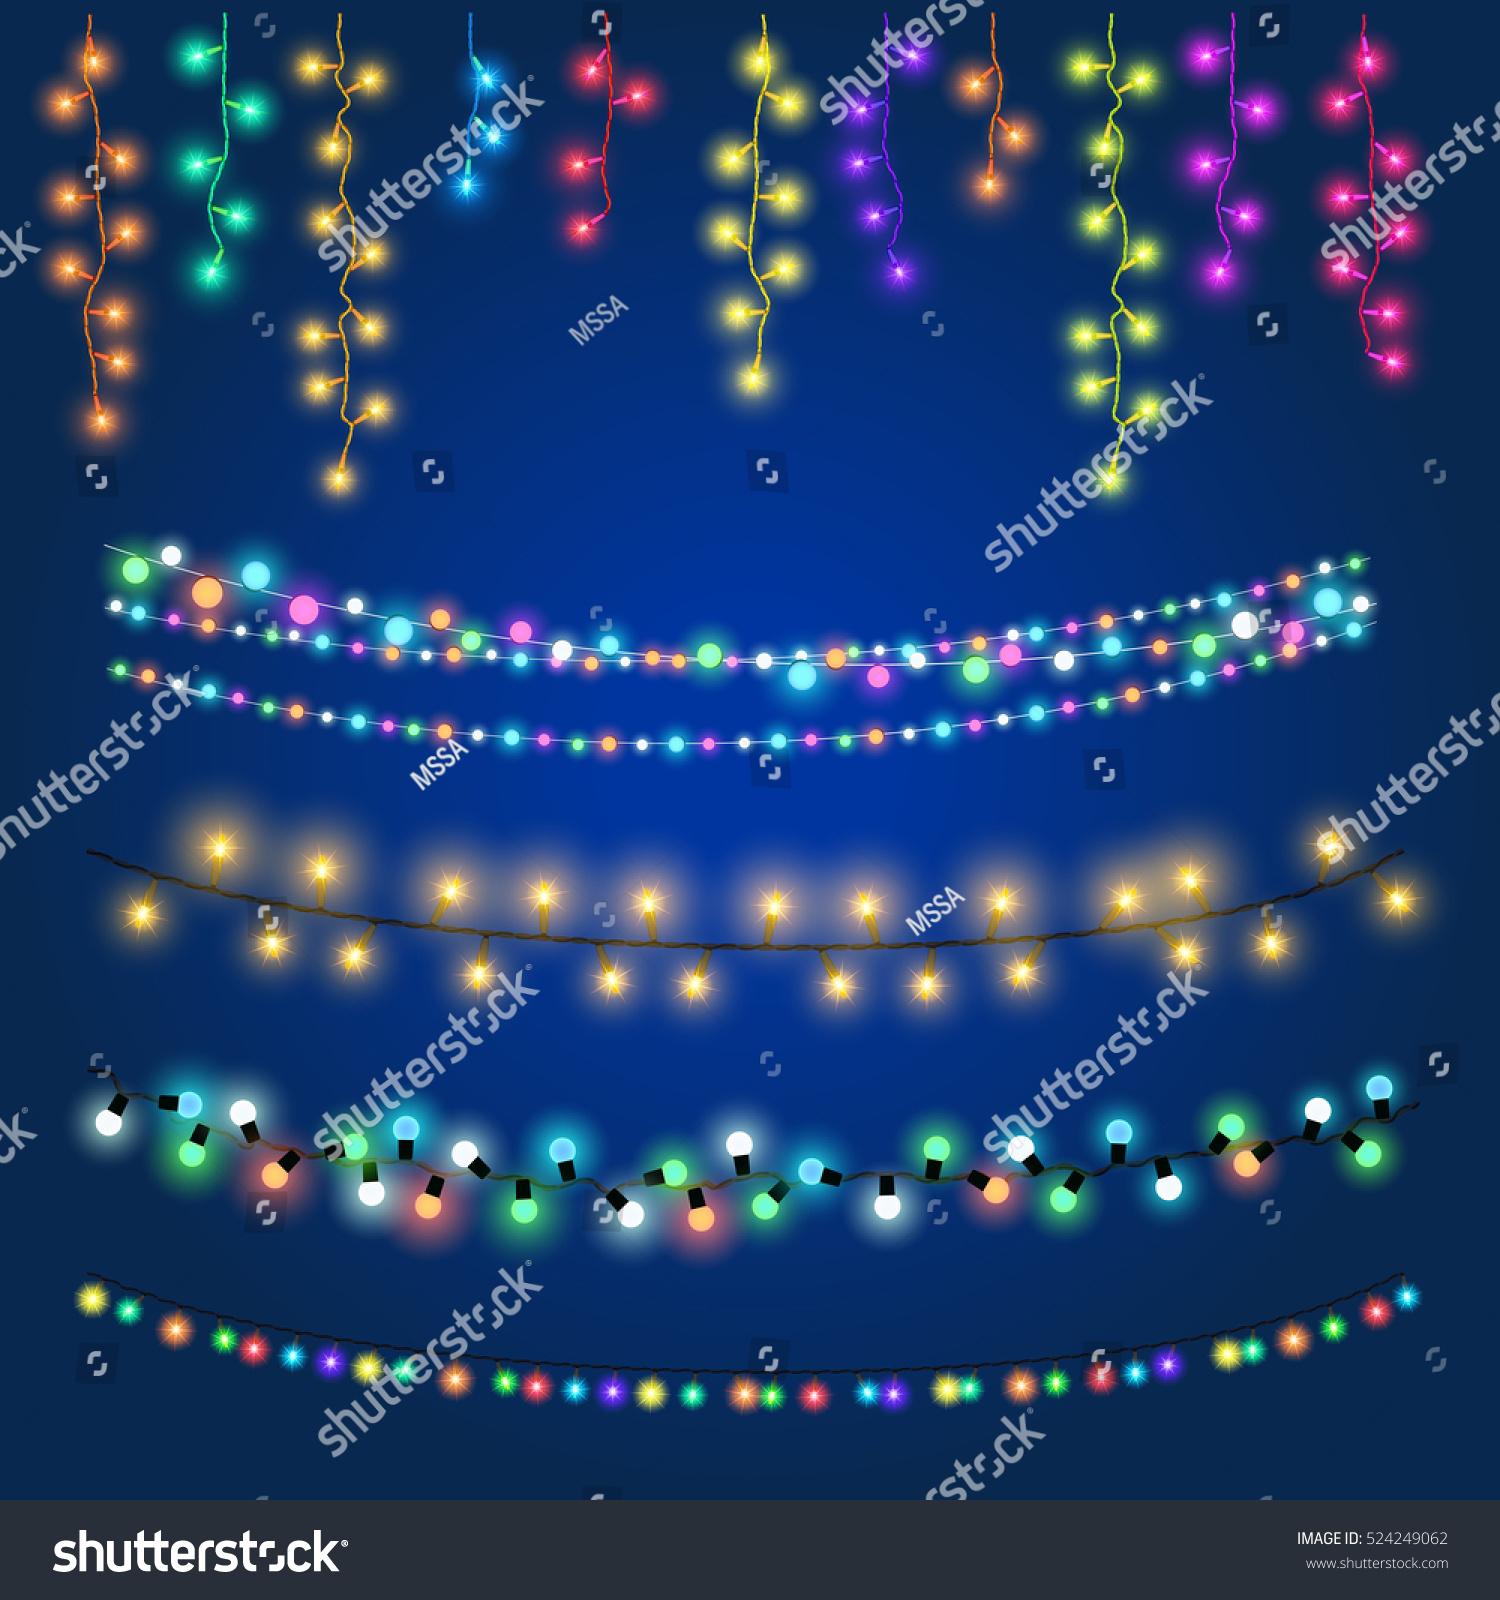 Christmas Fairy Hanging Lights Vector Illustration Stock Vector 524249062 - Shutterstock